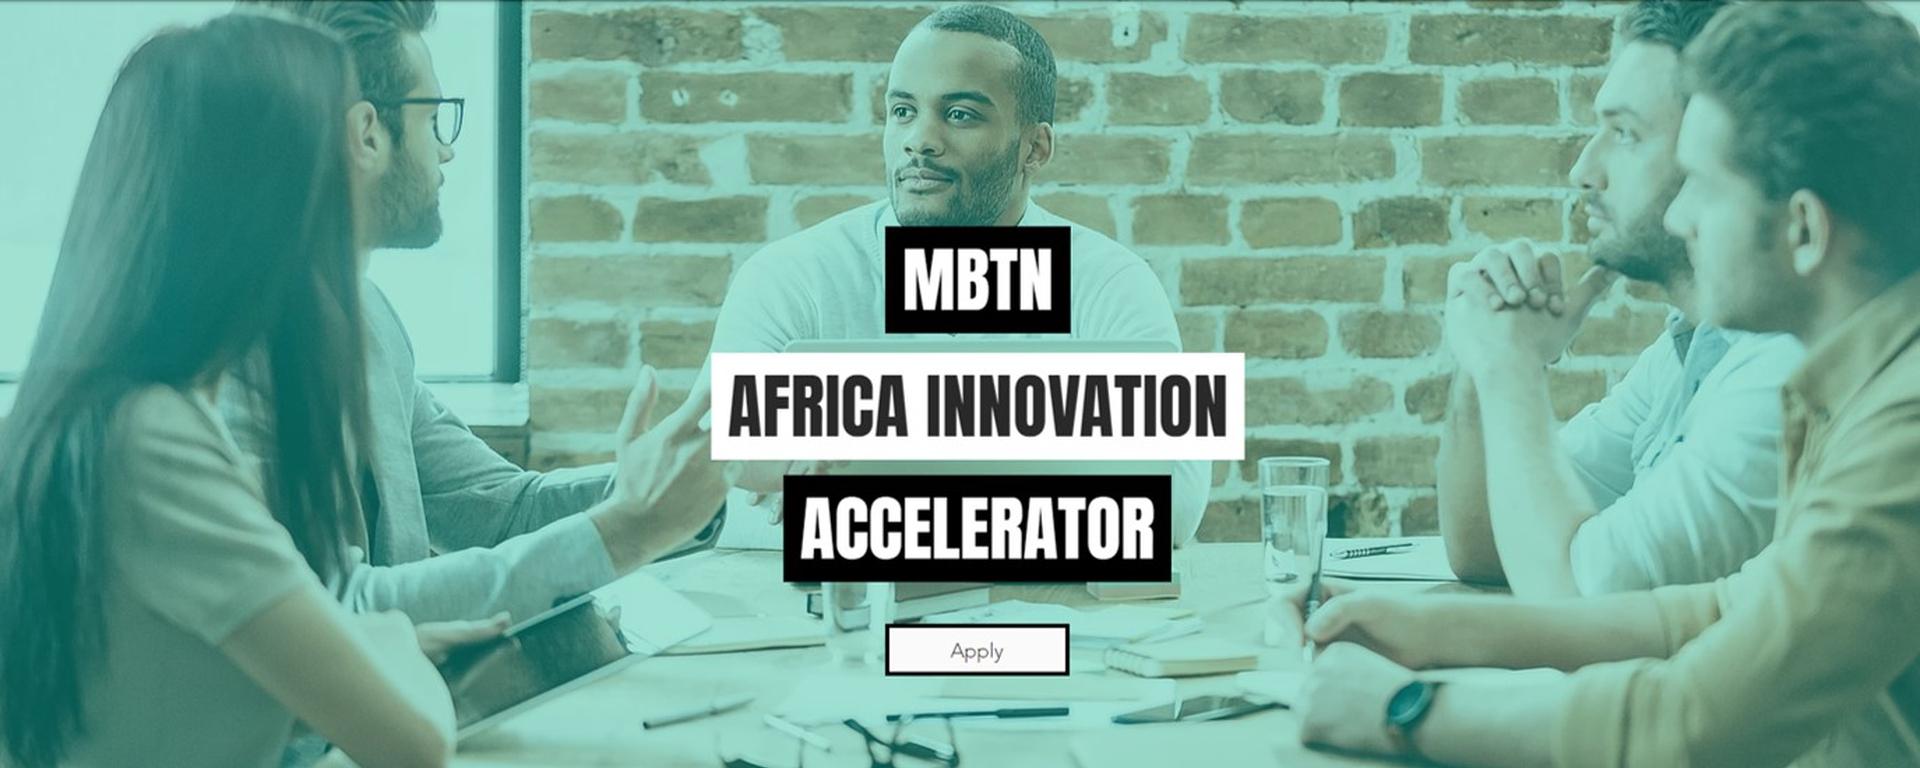 Unreasonable East Africa - Africa Innovation Accelerator Movemeback African initiative cover image